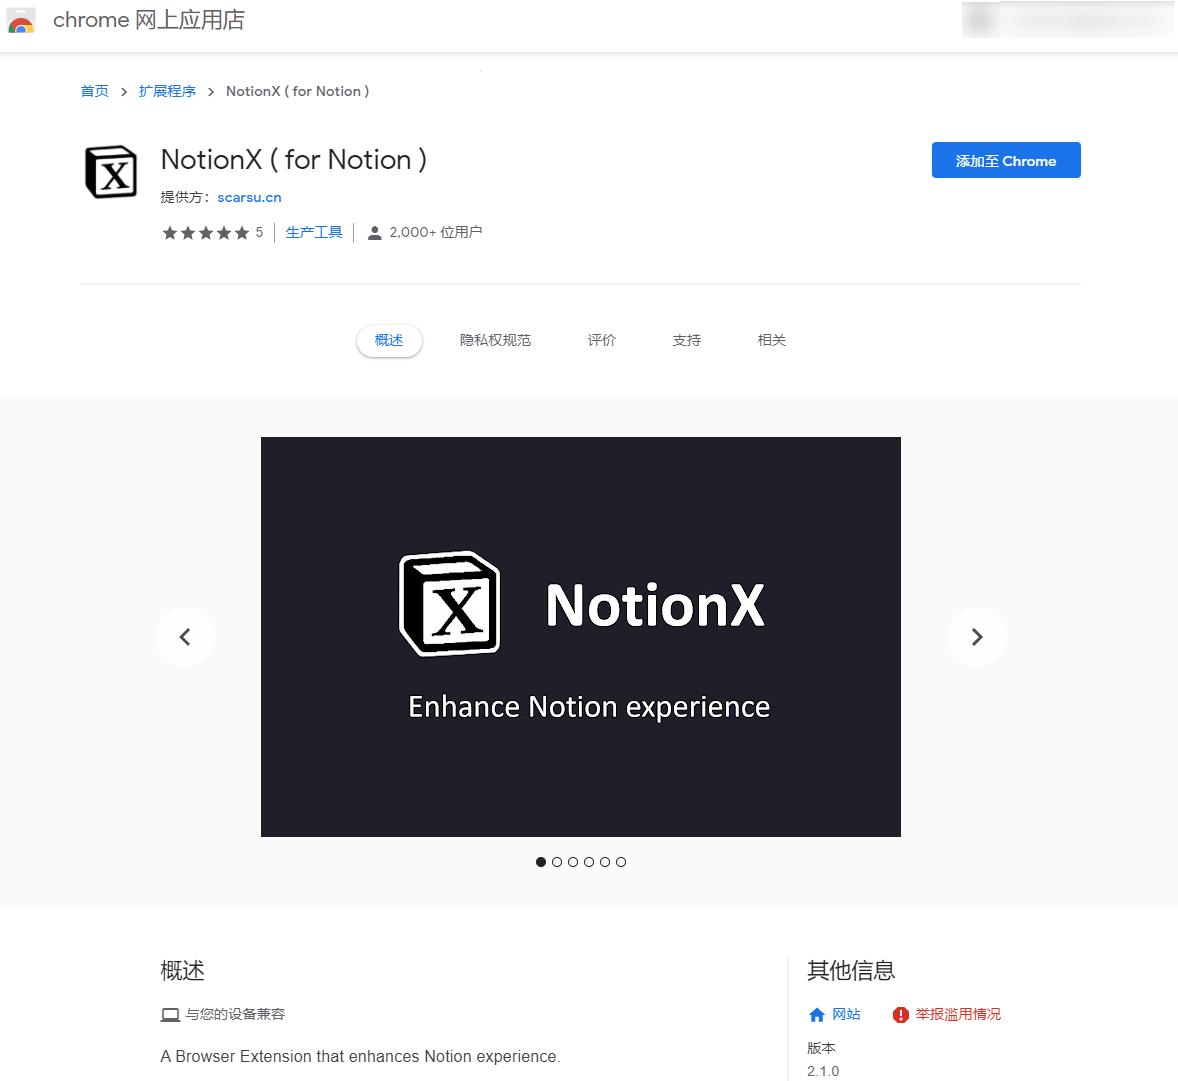 NotionX